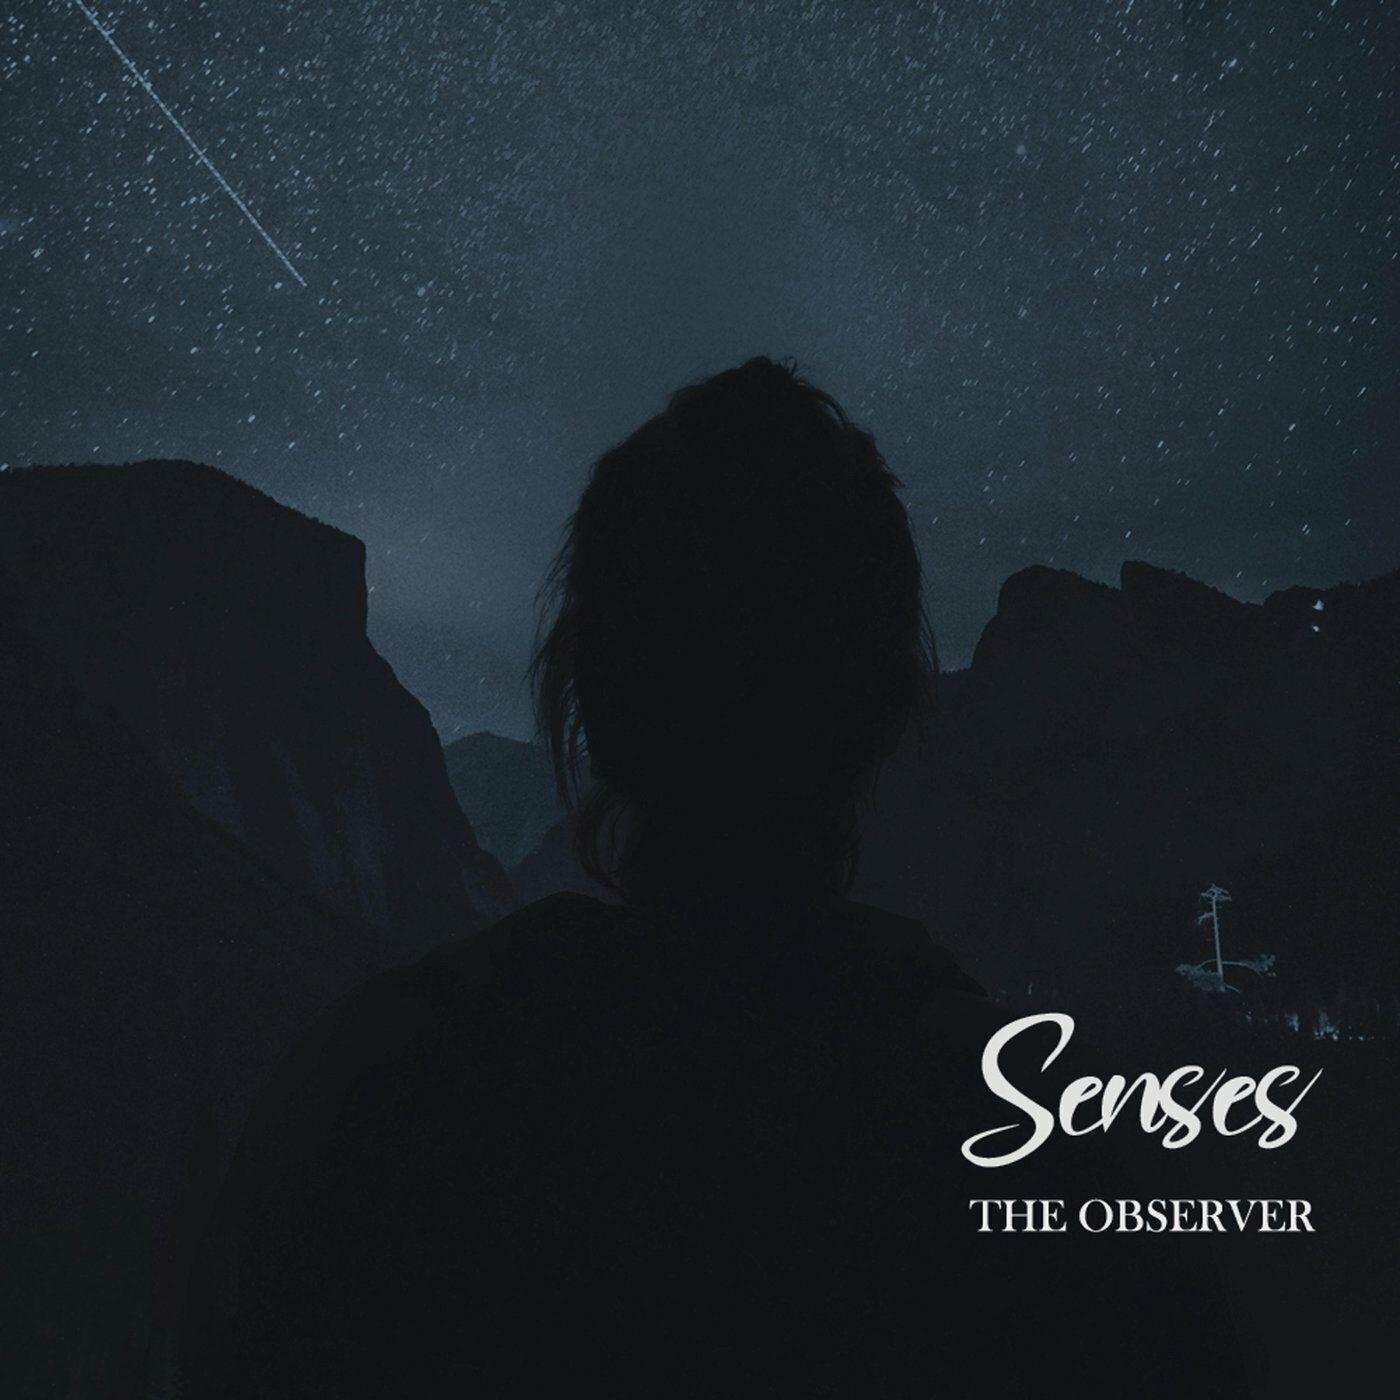 The Observer - Senses [single] (2020)